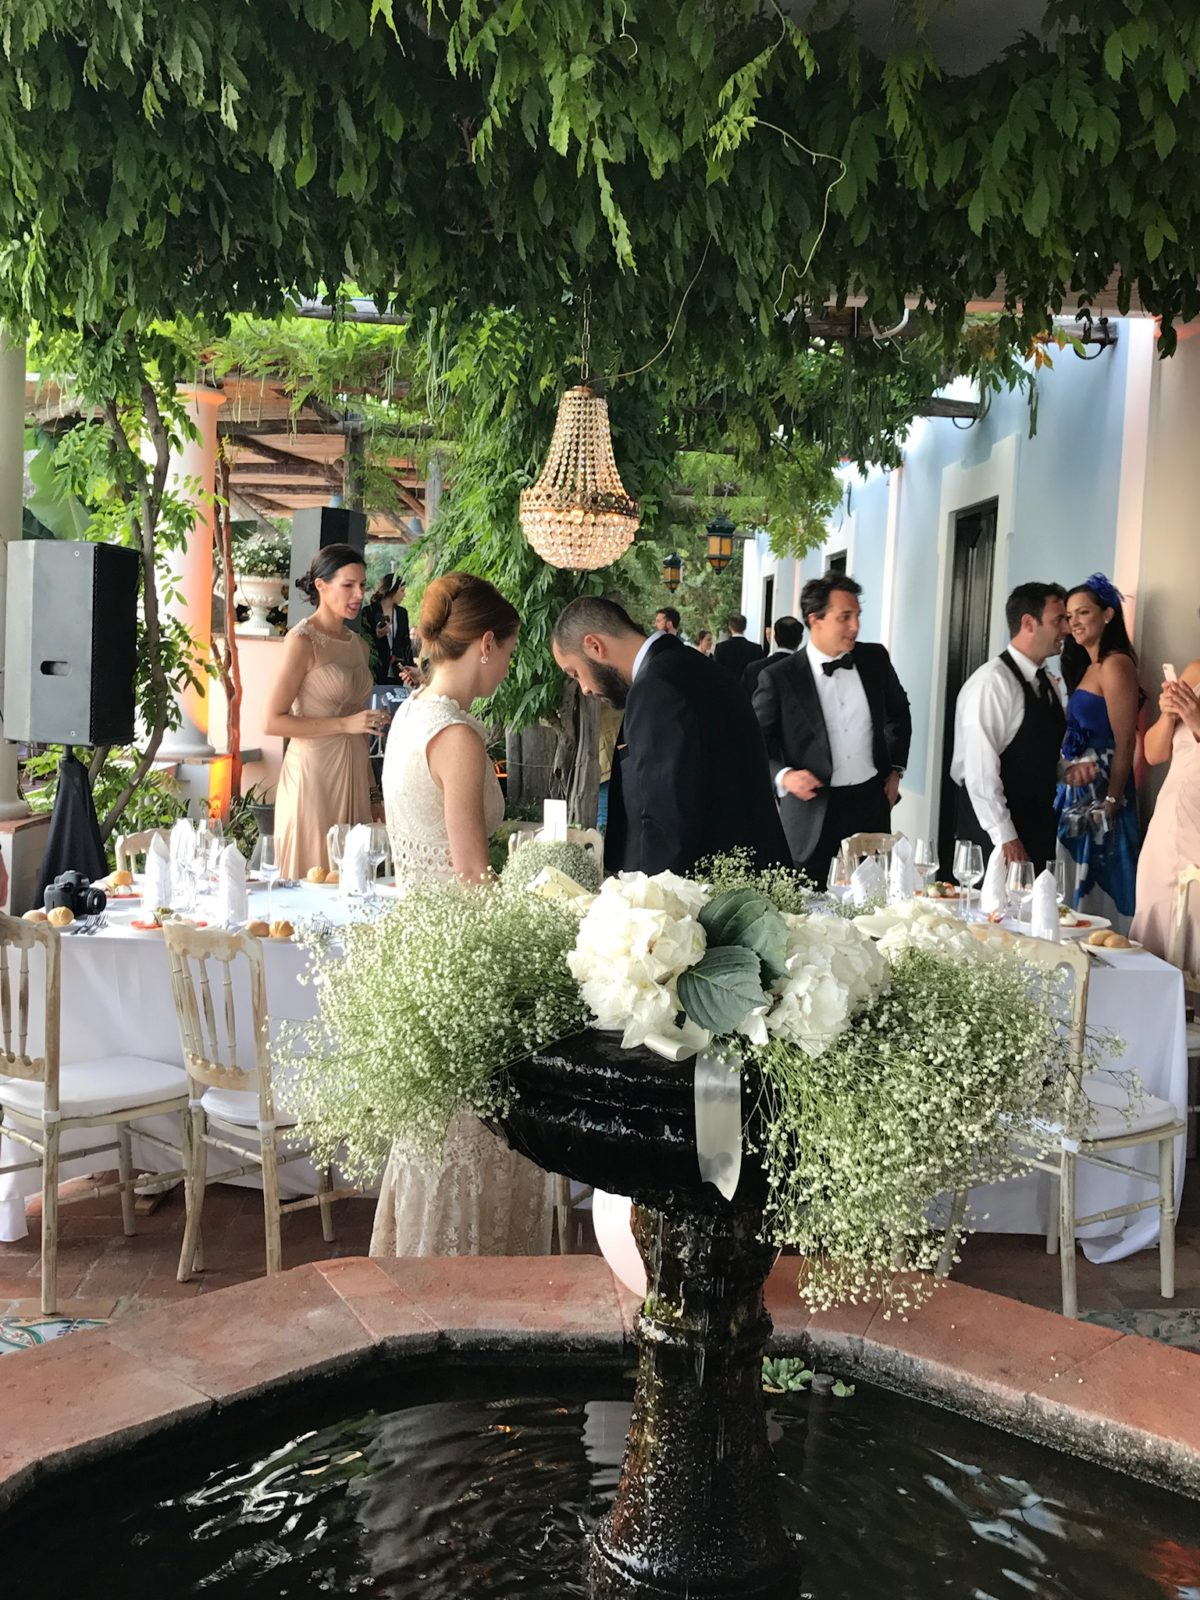 Nathalie and Benjamin Wedding in Positano Italy (31)